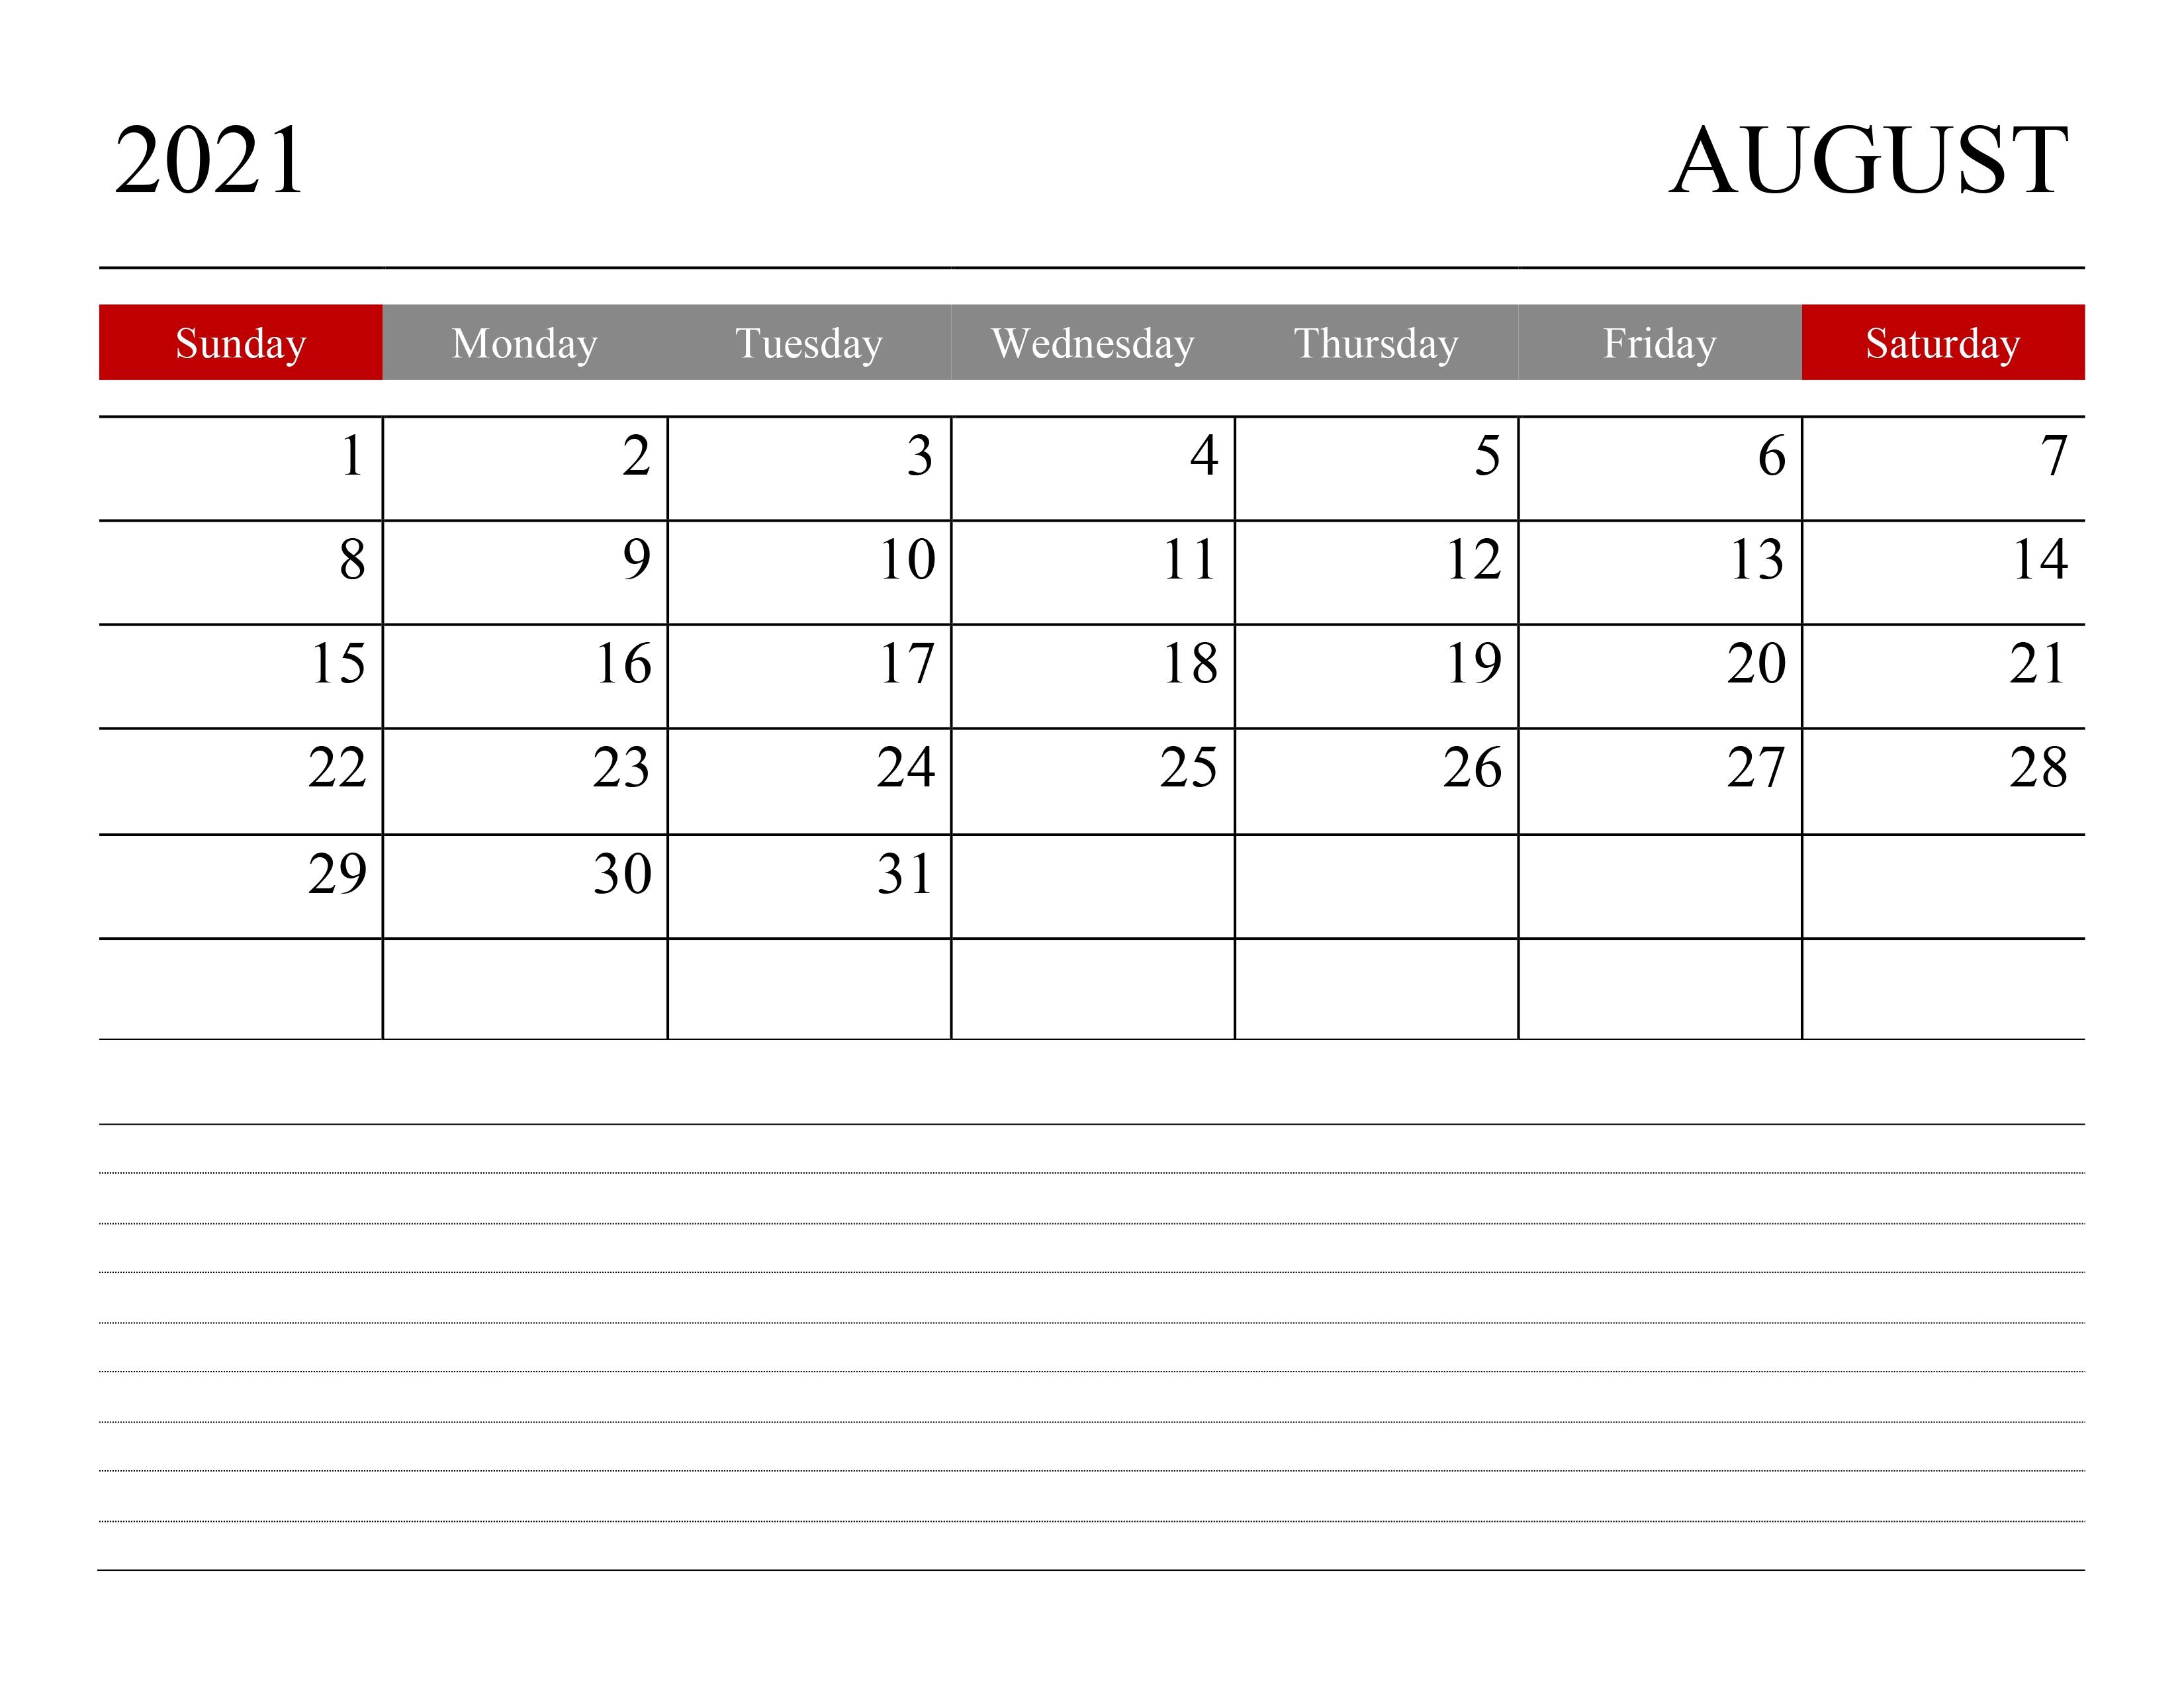 Calendar For August 2021 - Free-Calendar.su September 2021 Calendar Printable Wiki